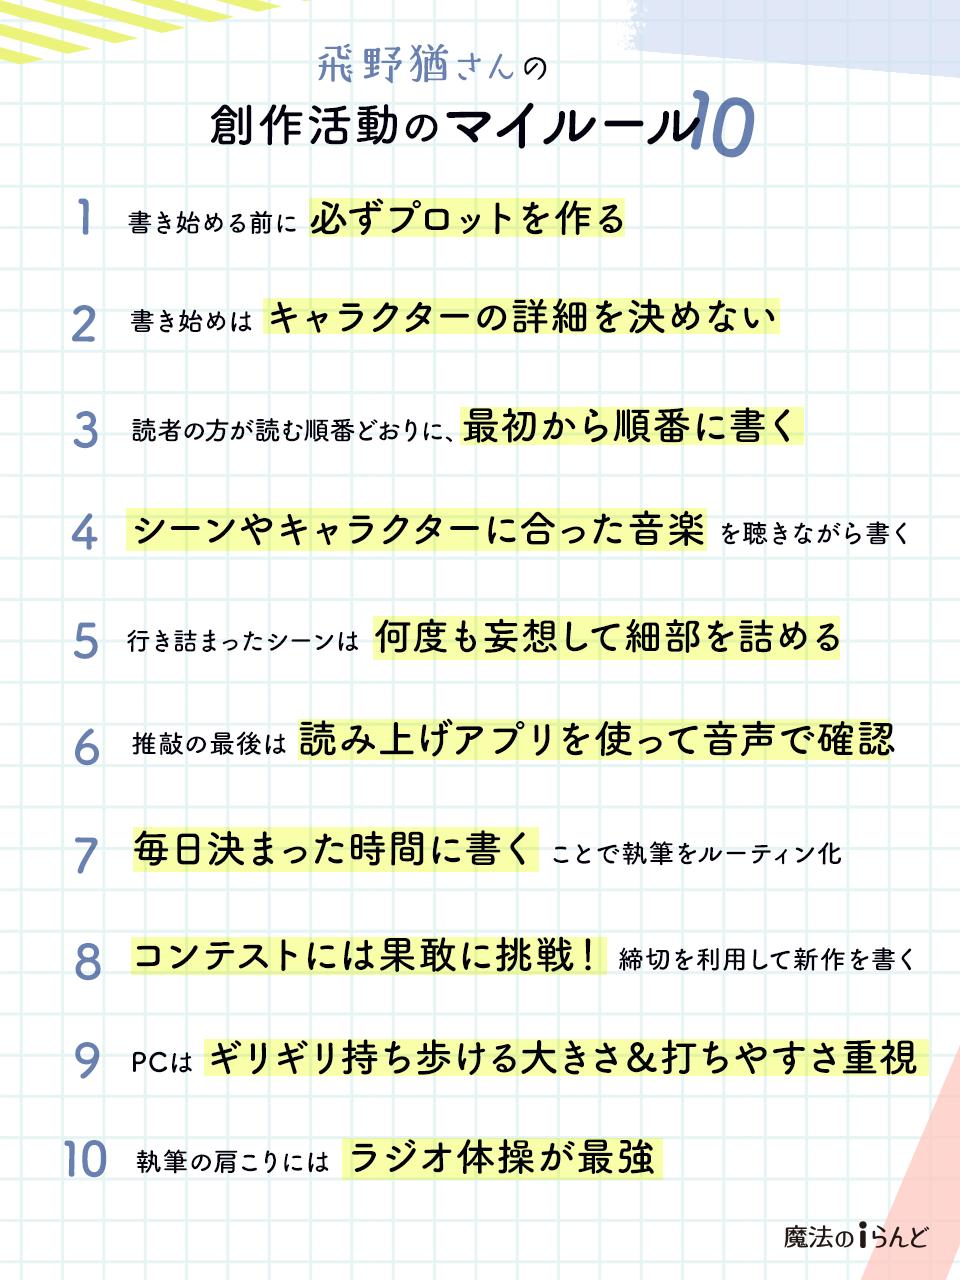 https://storage.googleapis.com/blog-info/entry/2021/08/05-myrule-tobino_twitter.png